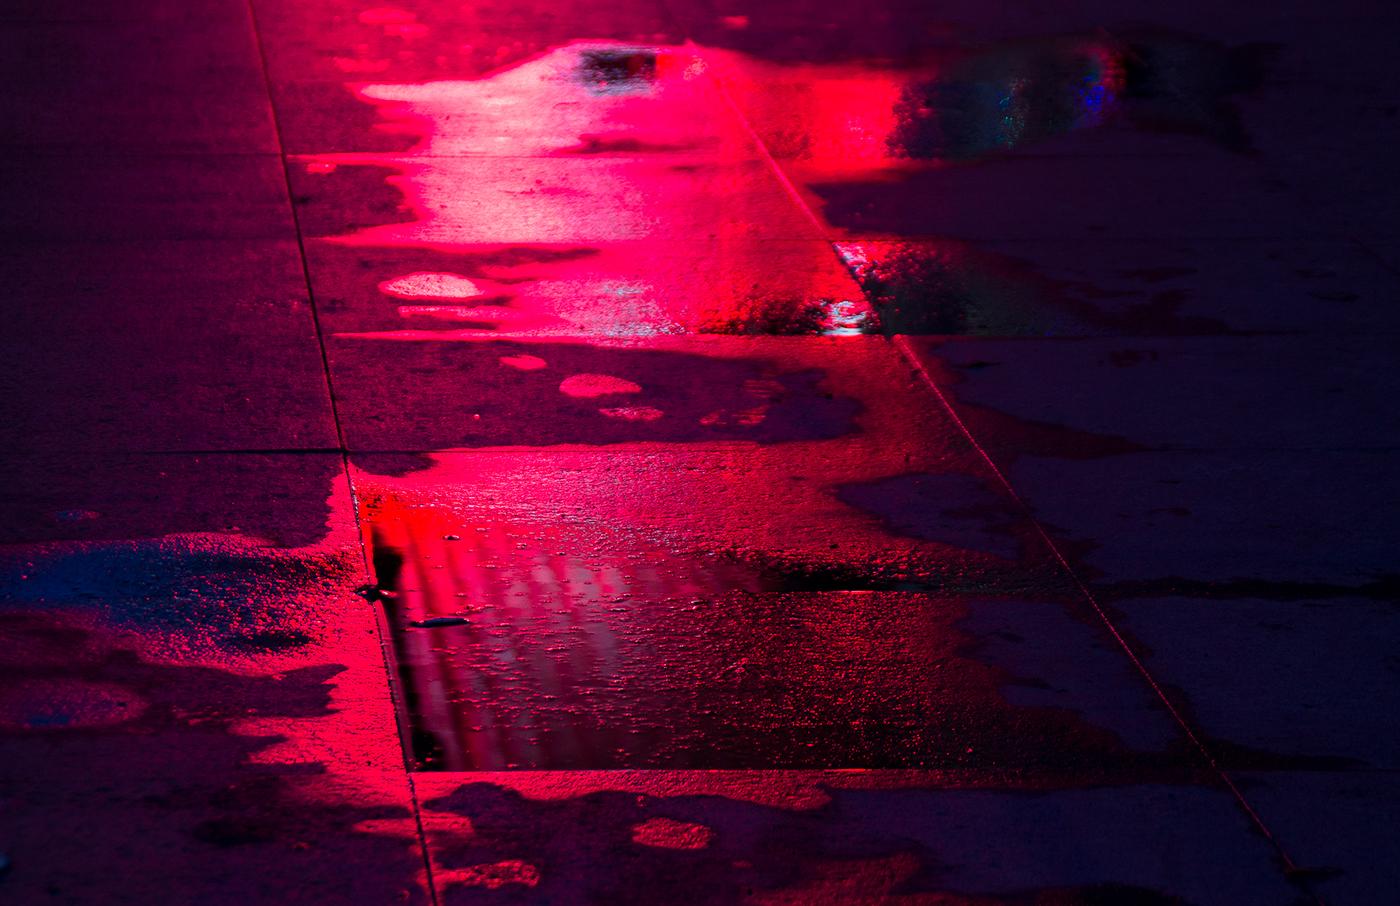 wet-neon-local-preacher-photography-8.jpg